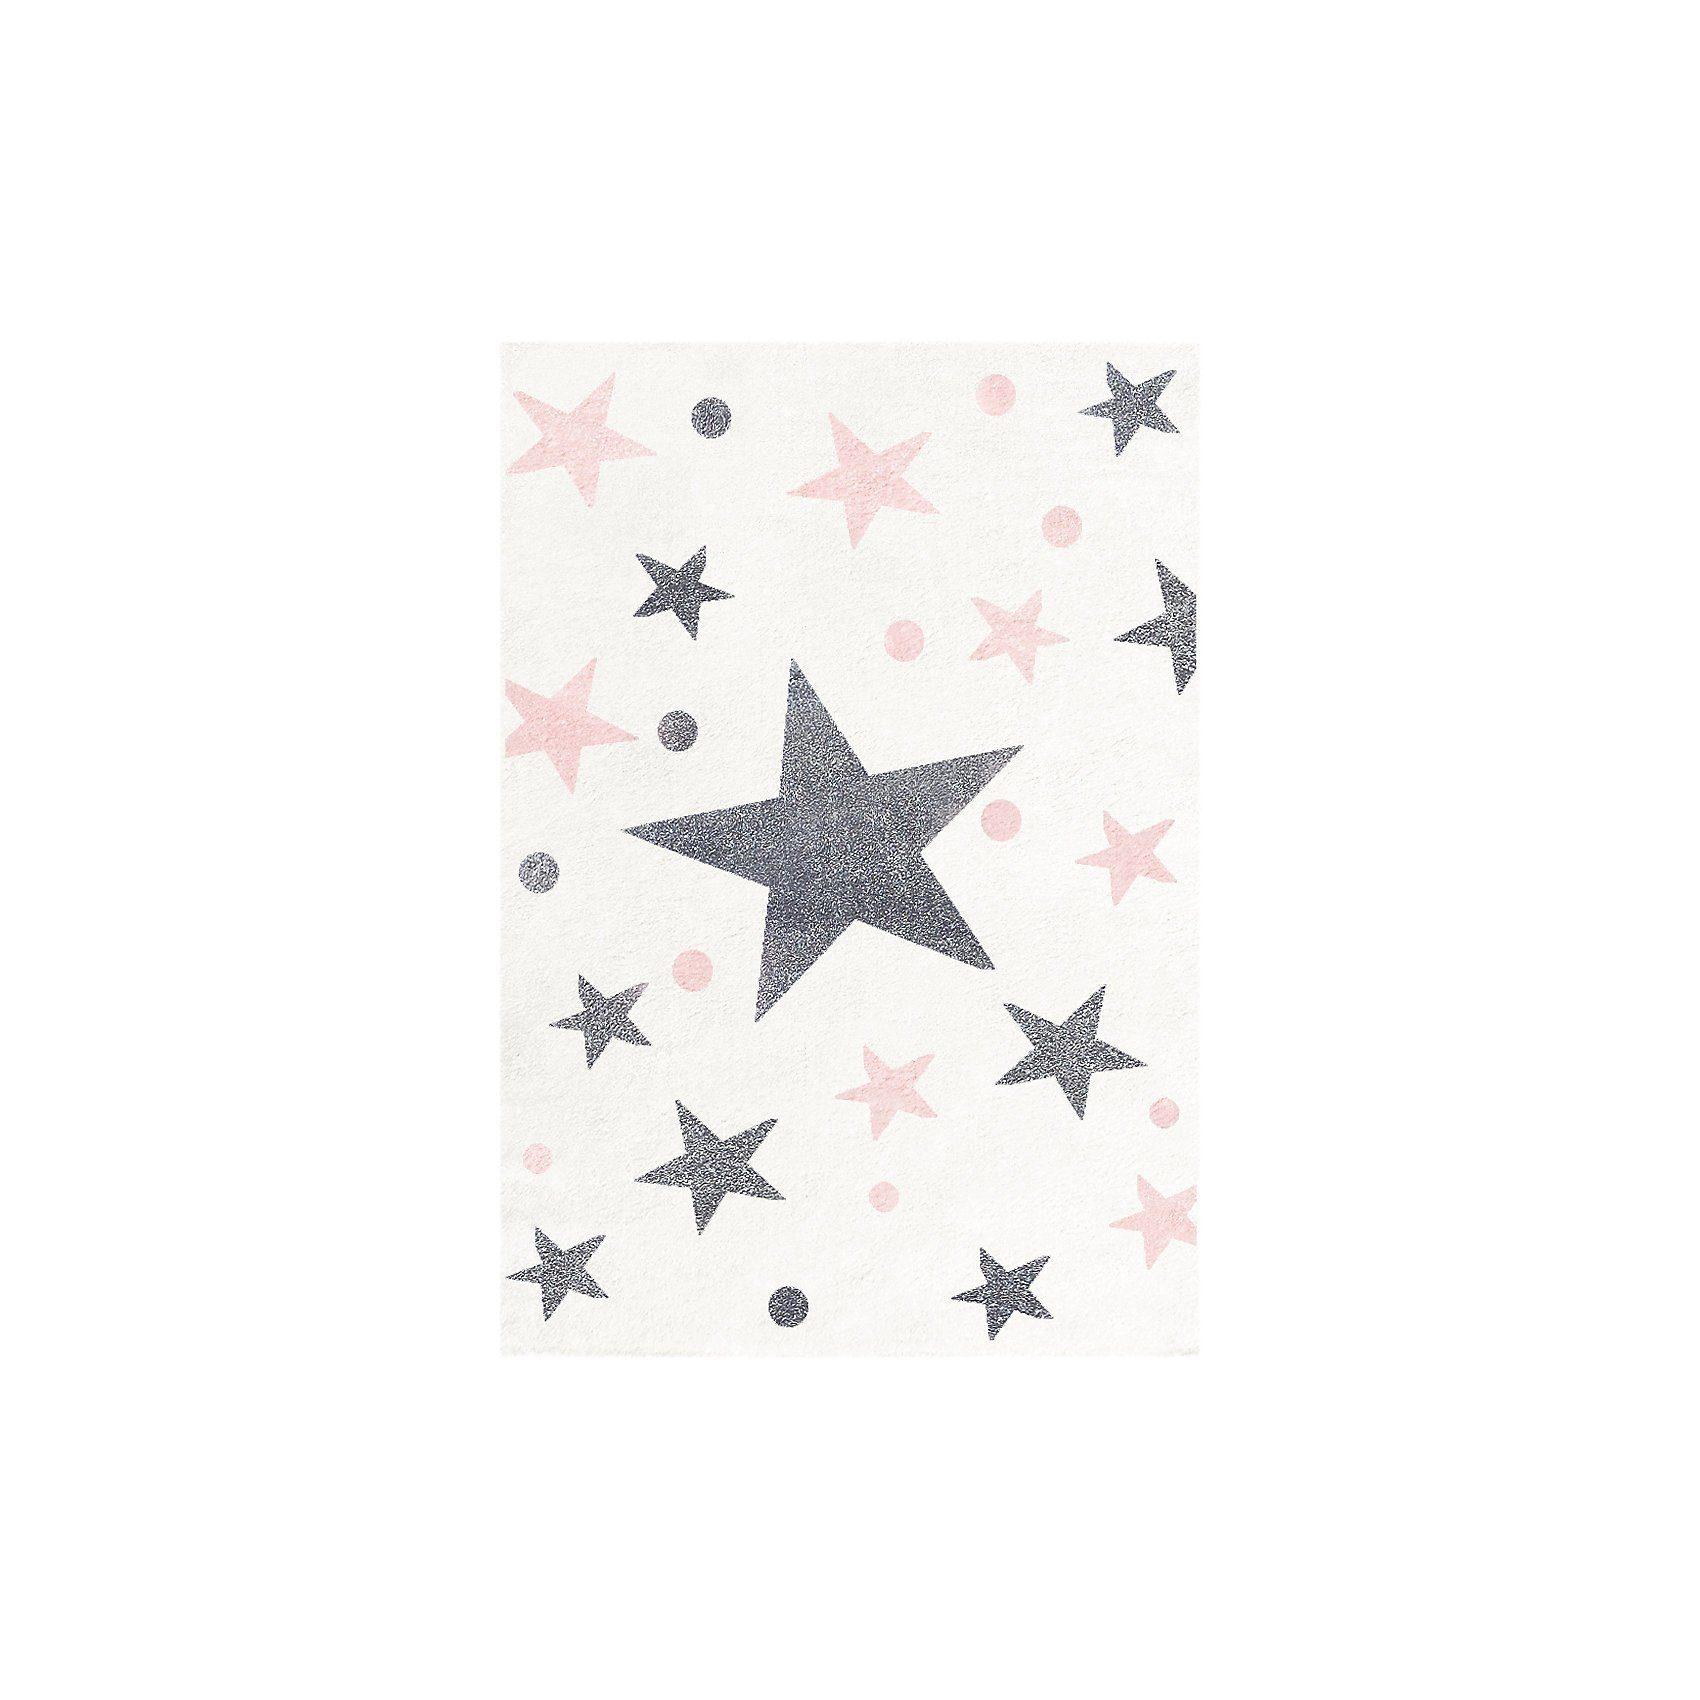 Happy Rugs Kinderteppich, STARS creme/silbergrau-rosa, 100 x 160 cm